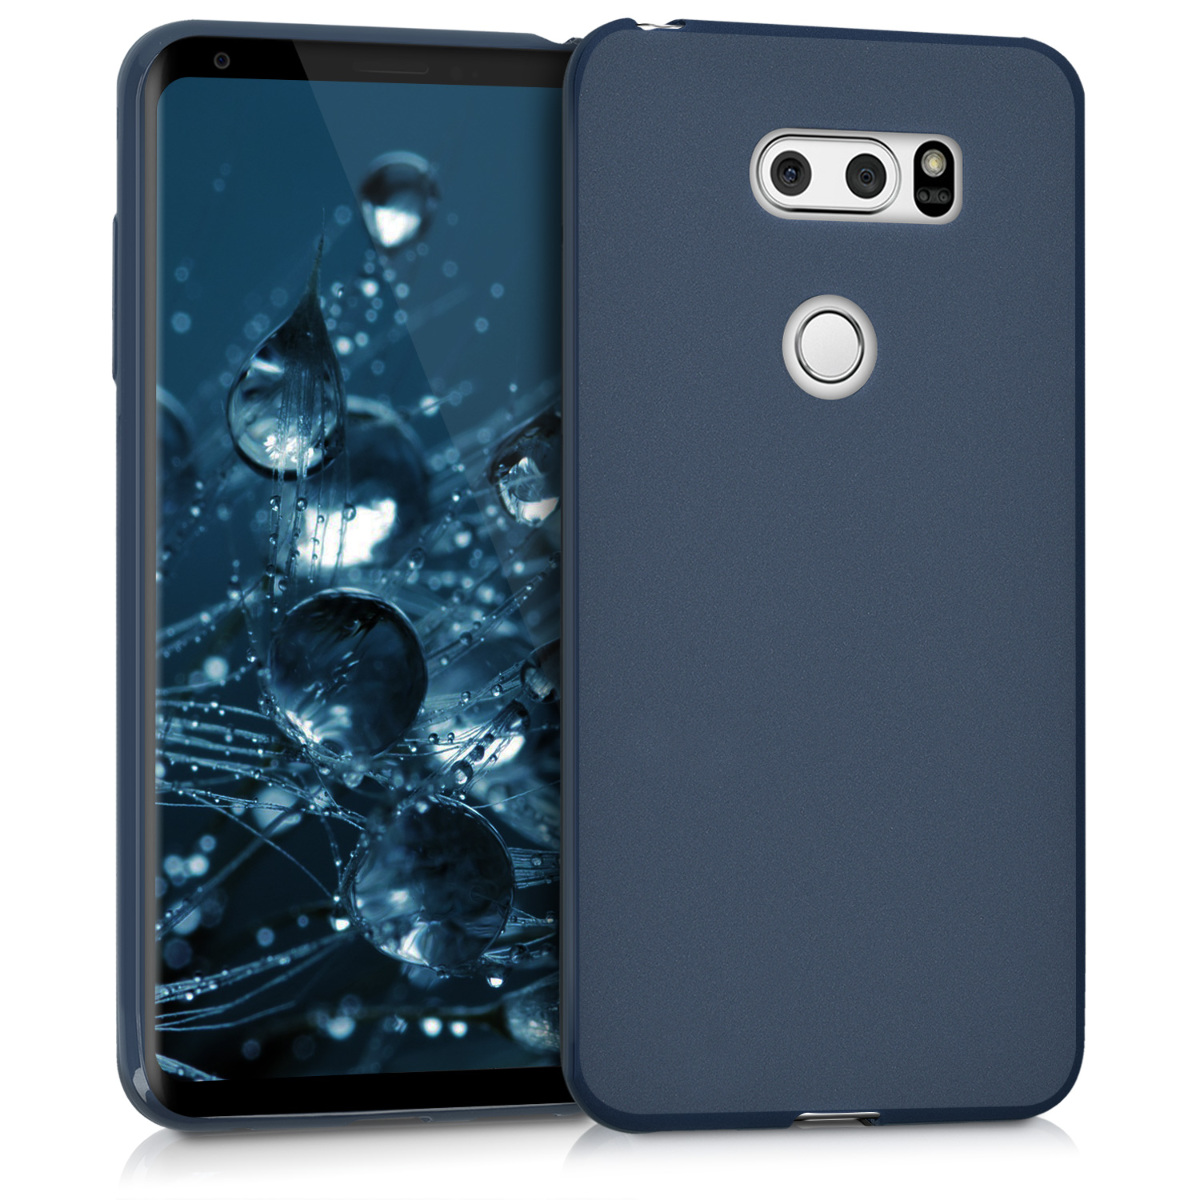 KW Θήκη Σιλικόνης LG V30 - Dark Blue Matte (42749.53)